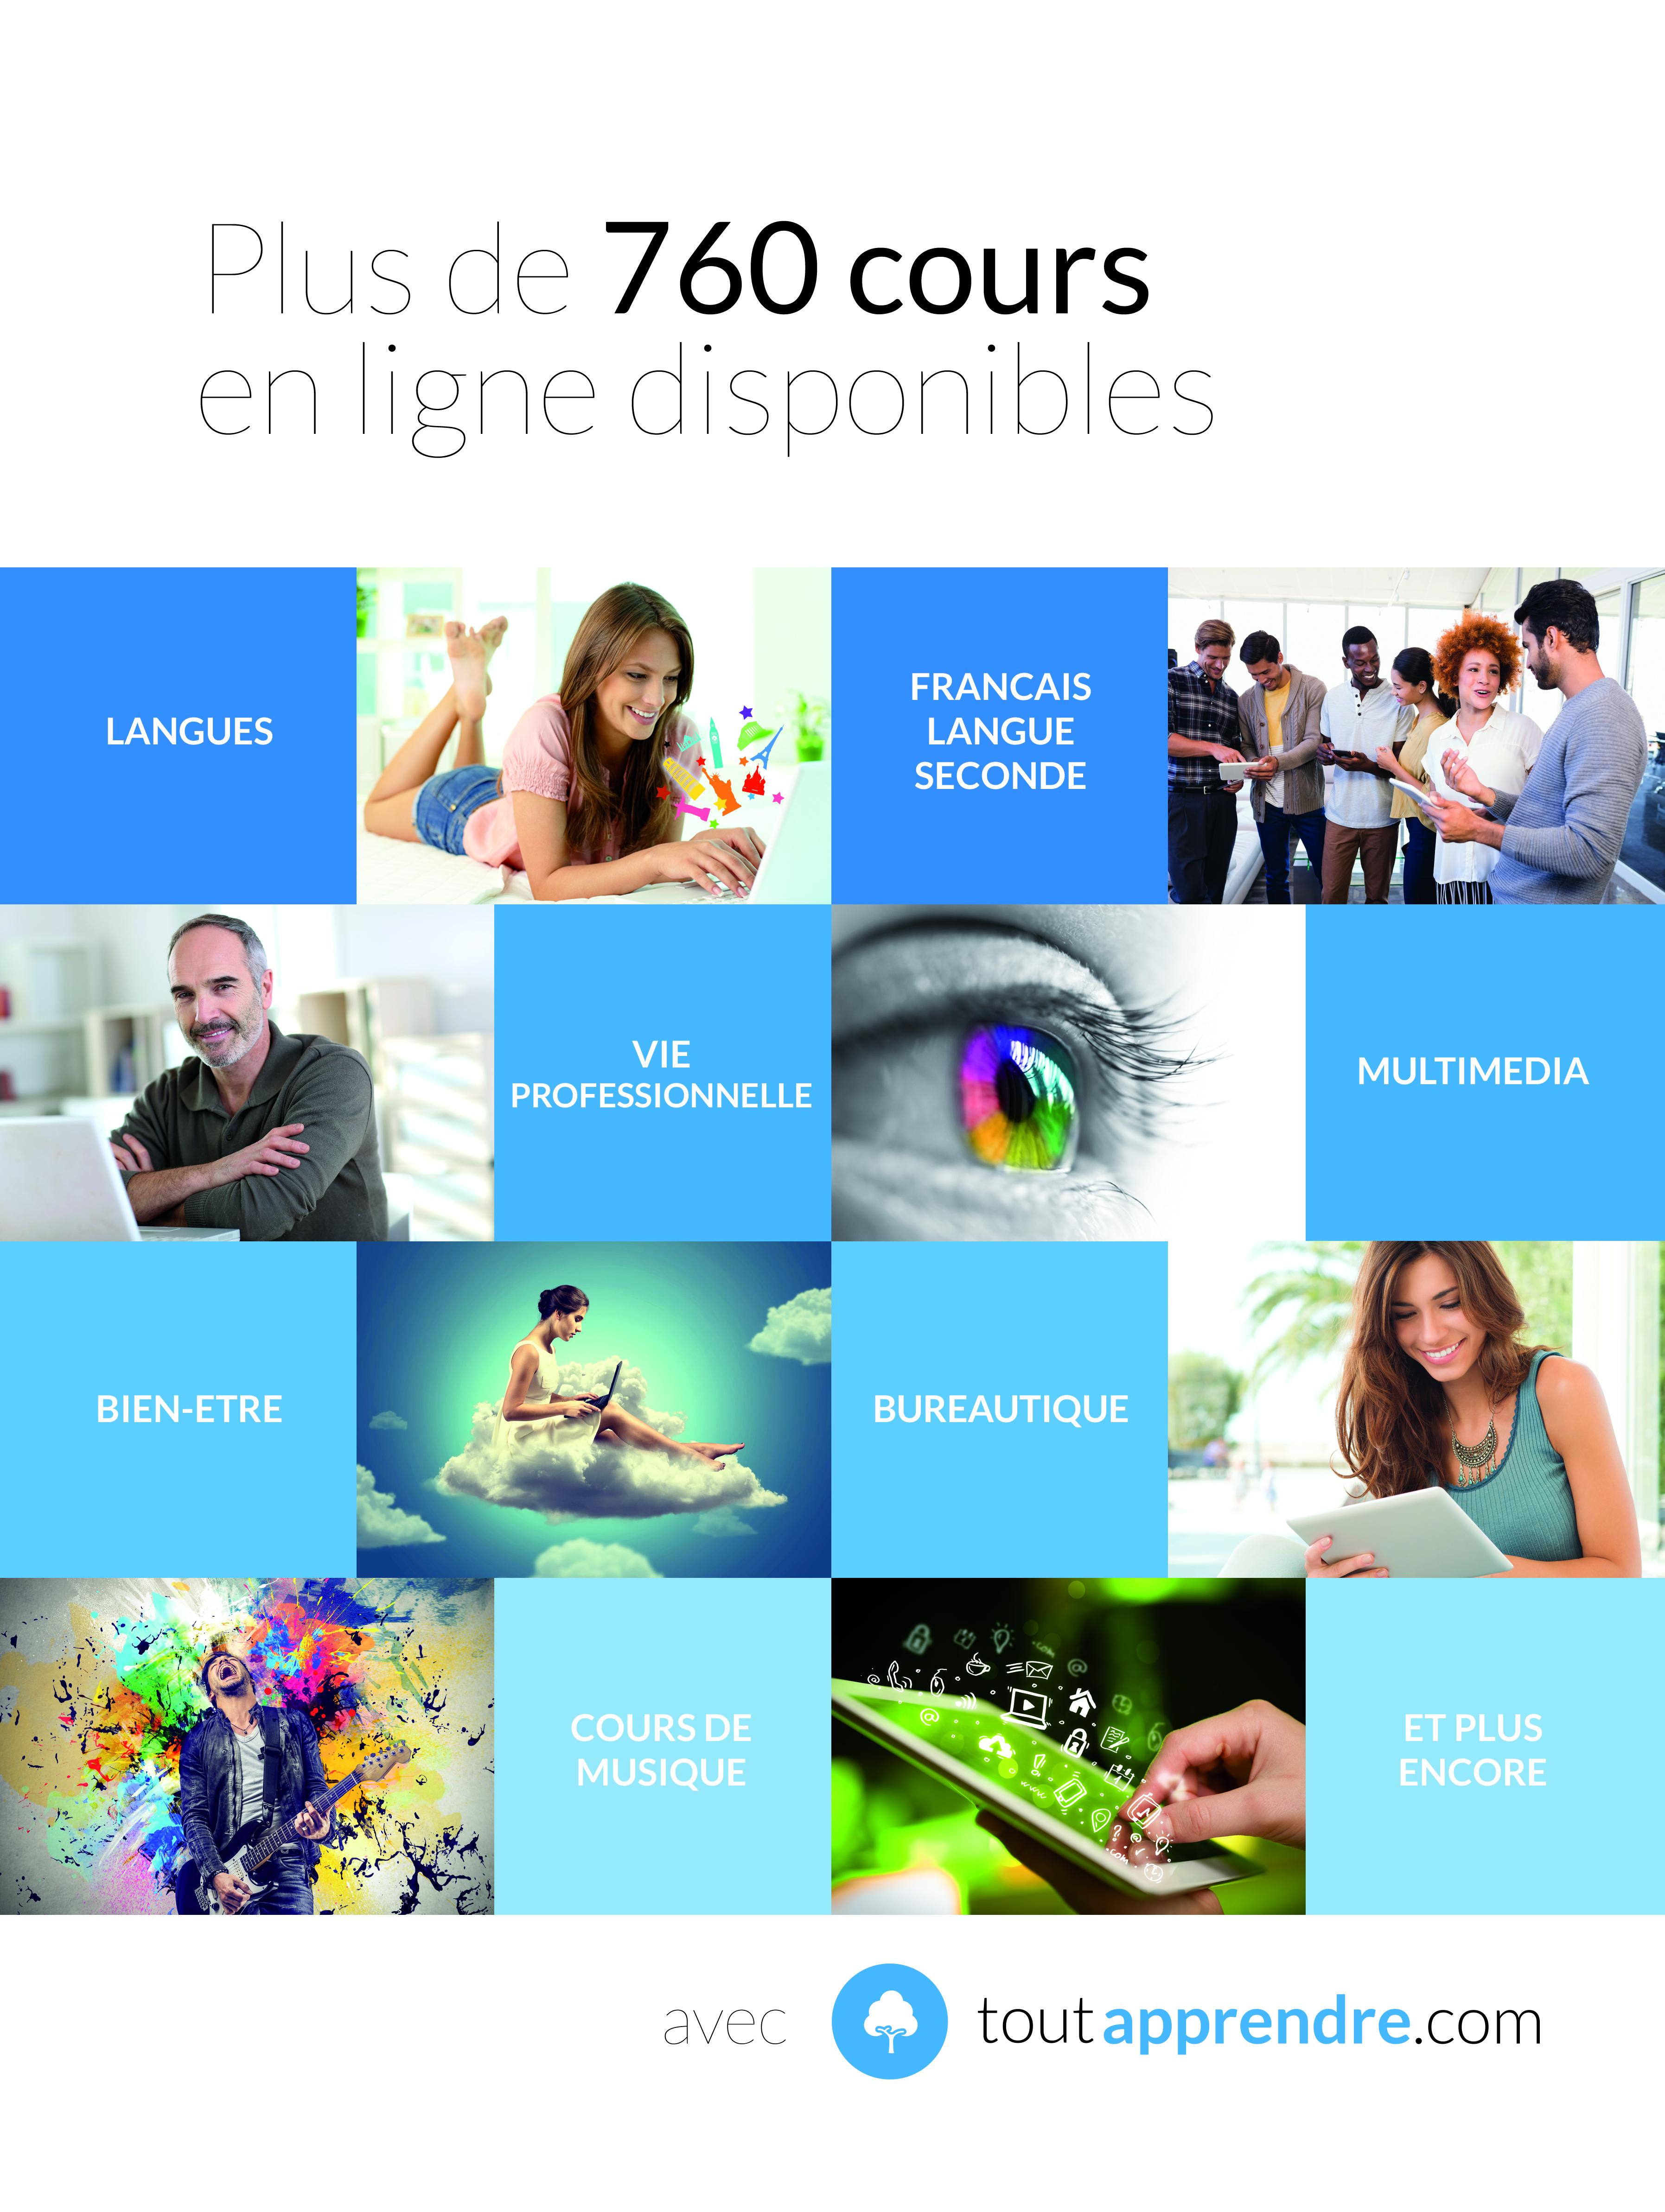 https://biblio.toutapprendre.com/ressources/v2/affiches/Affiche%20Med%20Qu%C3%A9bec_30x40.jpg